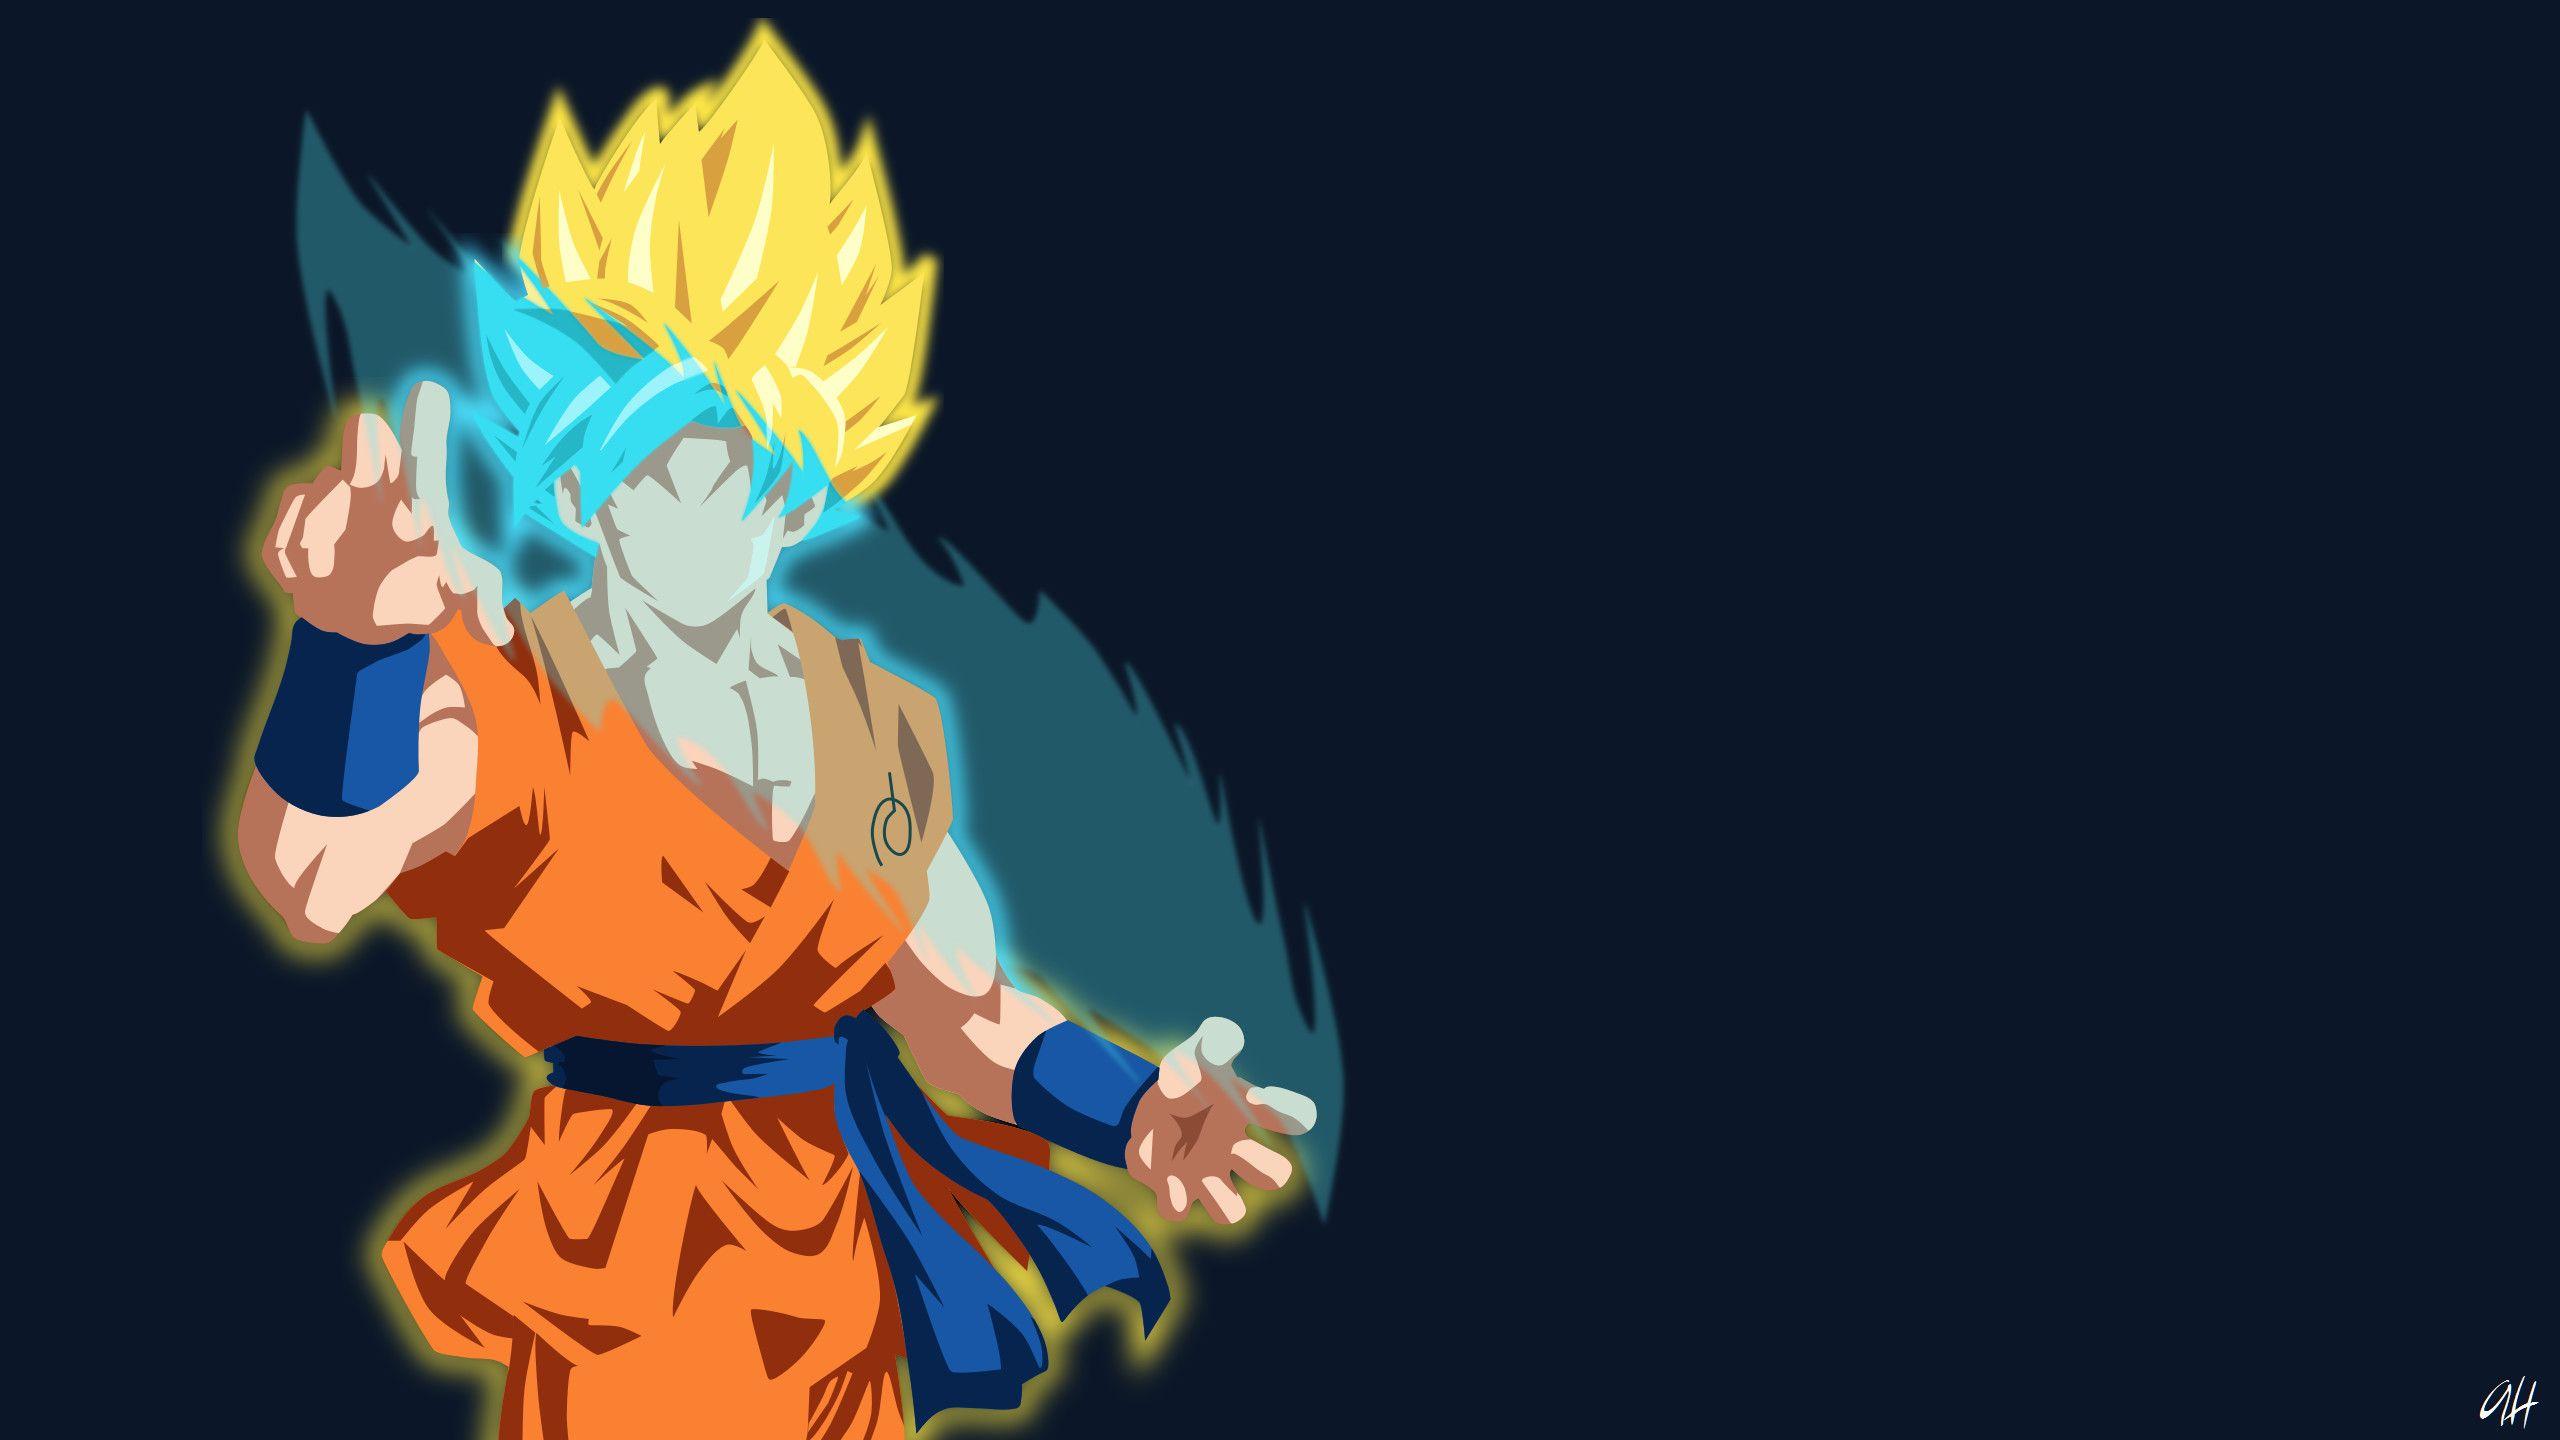 2560x1440 Dragon Ball Super Super Saiyan Blue Vegeta A Hd Wallpaper Background Id 82093 Goku Wallpaper Dragon Ball Super Wallpapers Dragon Ball Super Manga